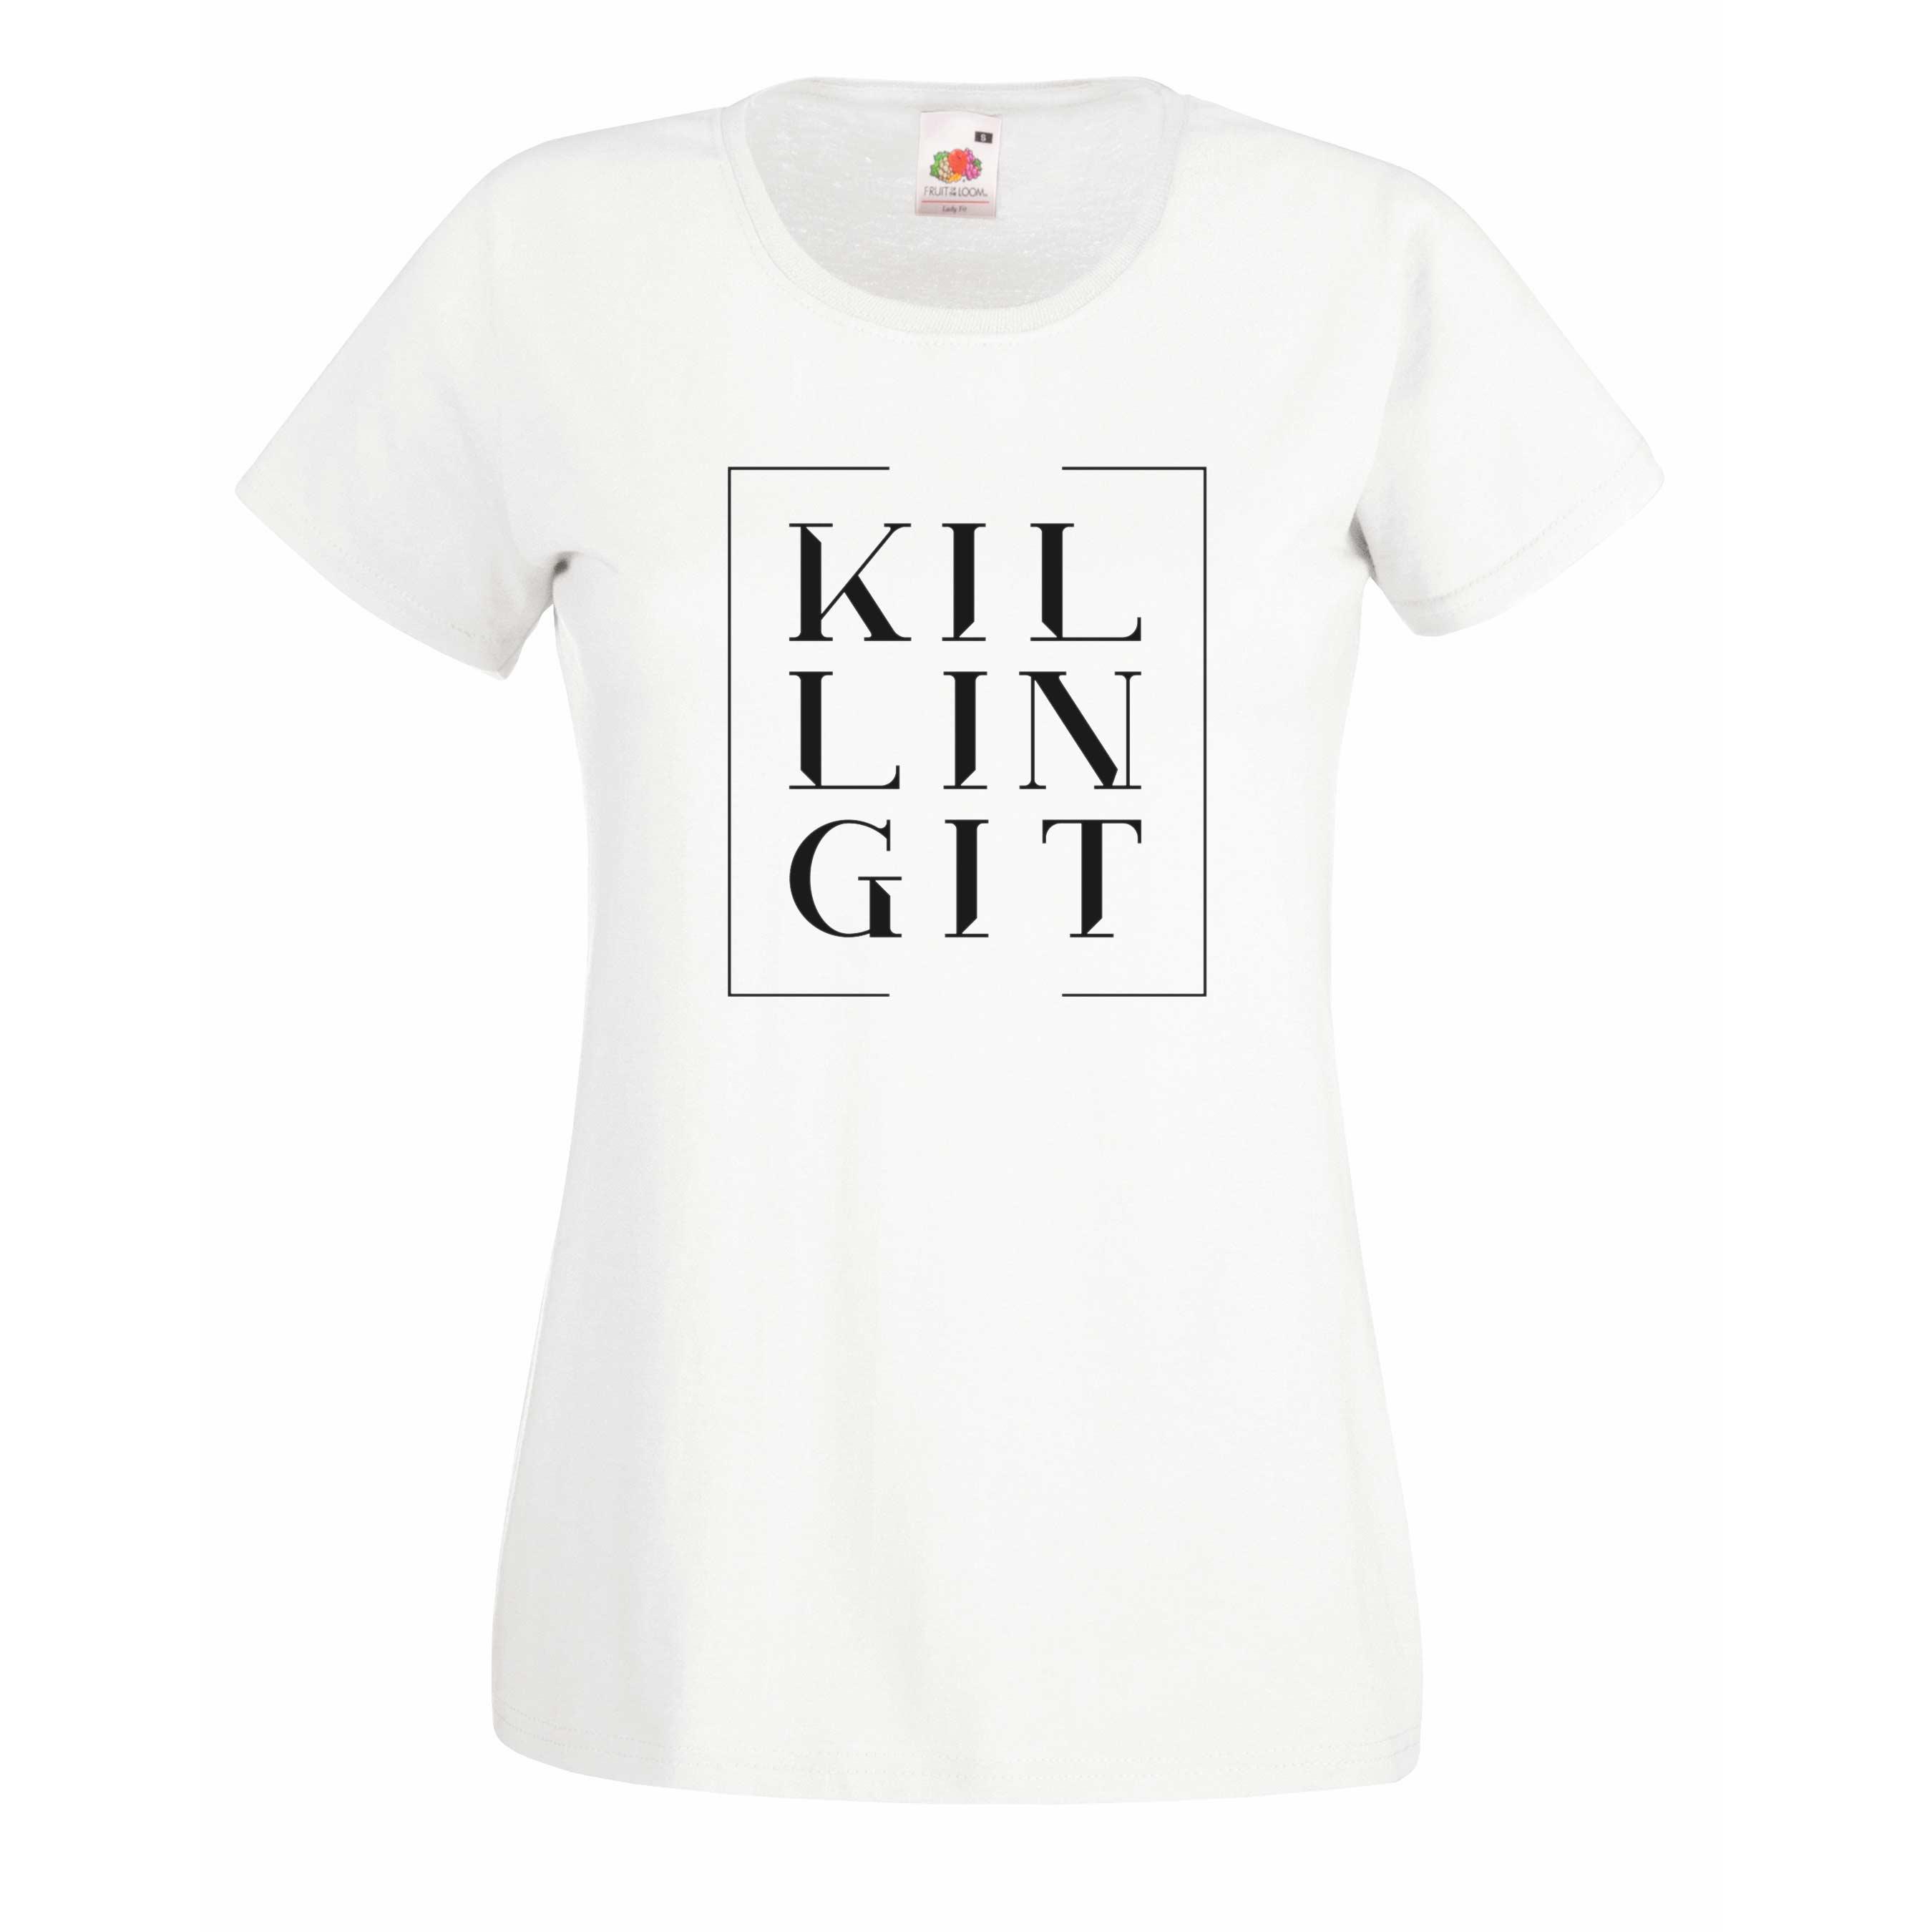 Killing It design for t-shirt, hoodie & sweatshirt